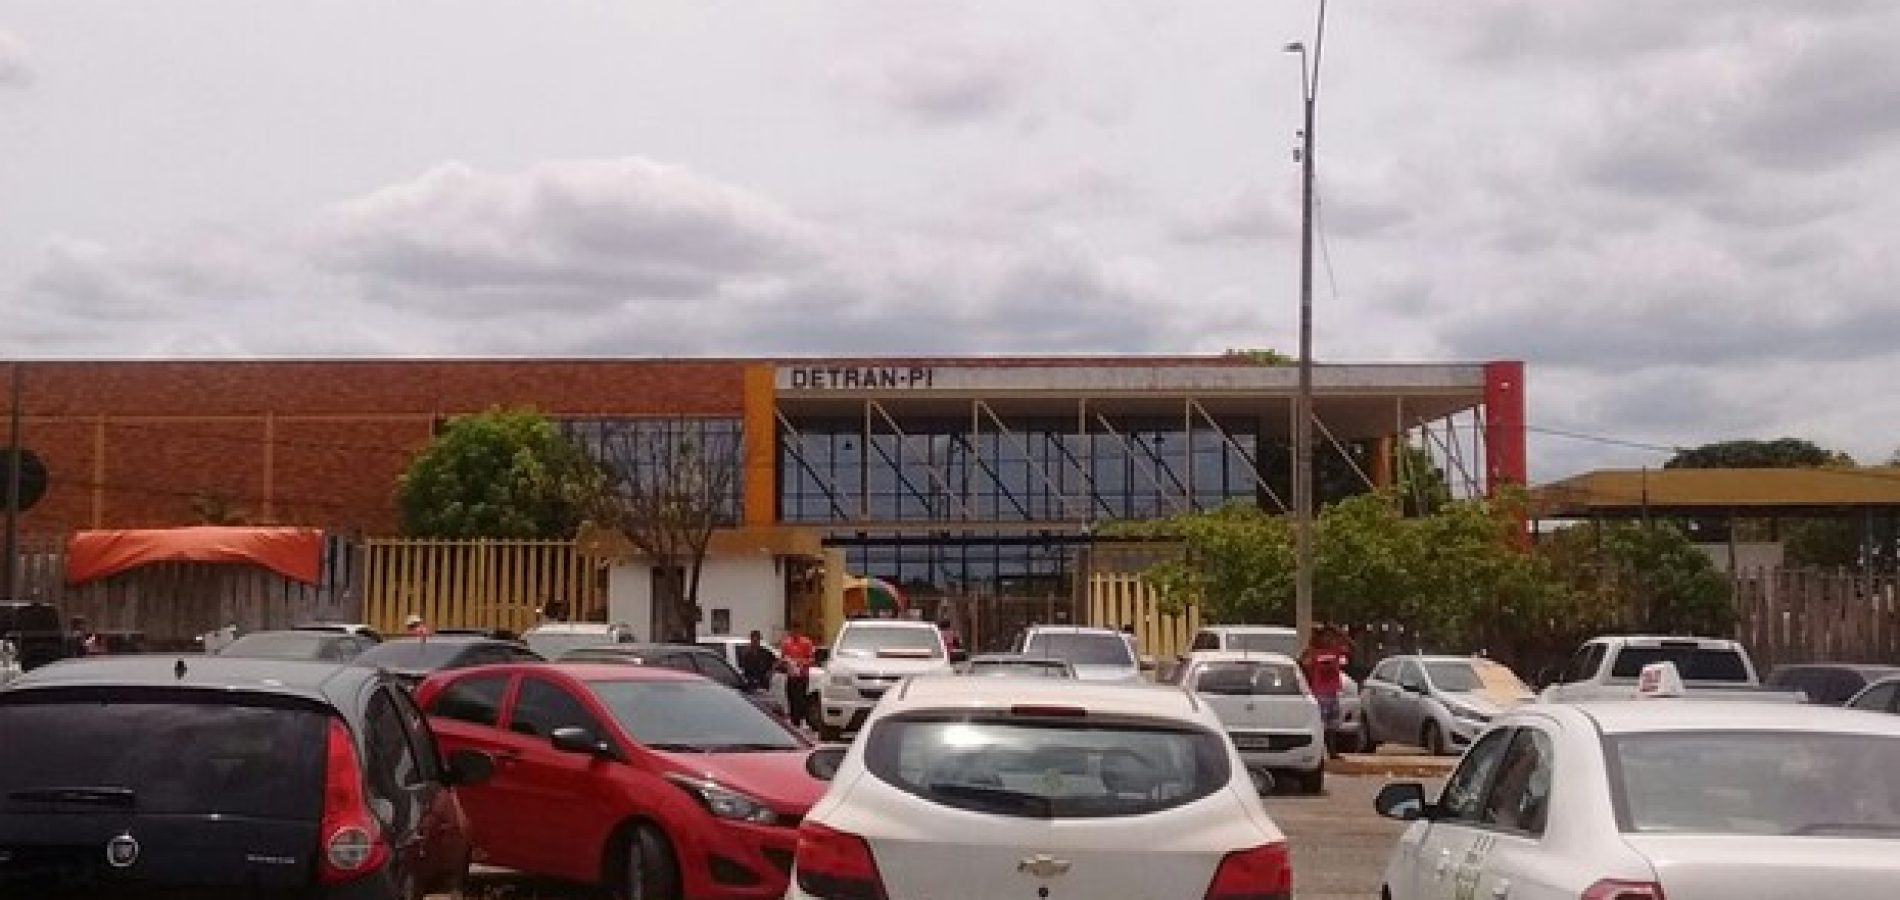 Detran-PI cancela aulas e deixa cerca de 60 alunos do interior no prejuízo